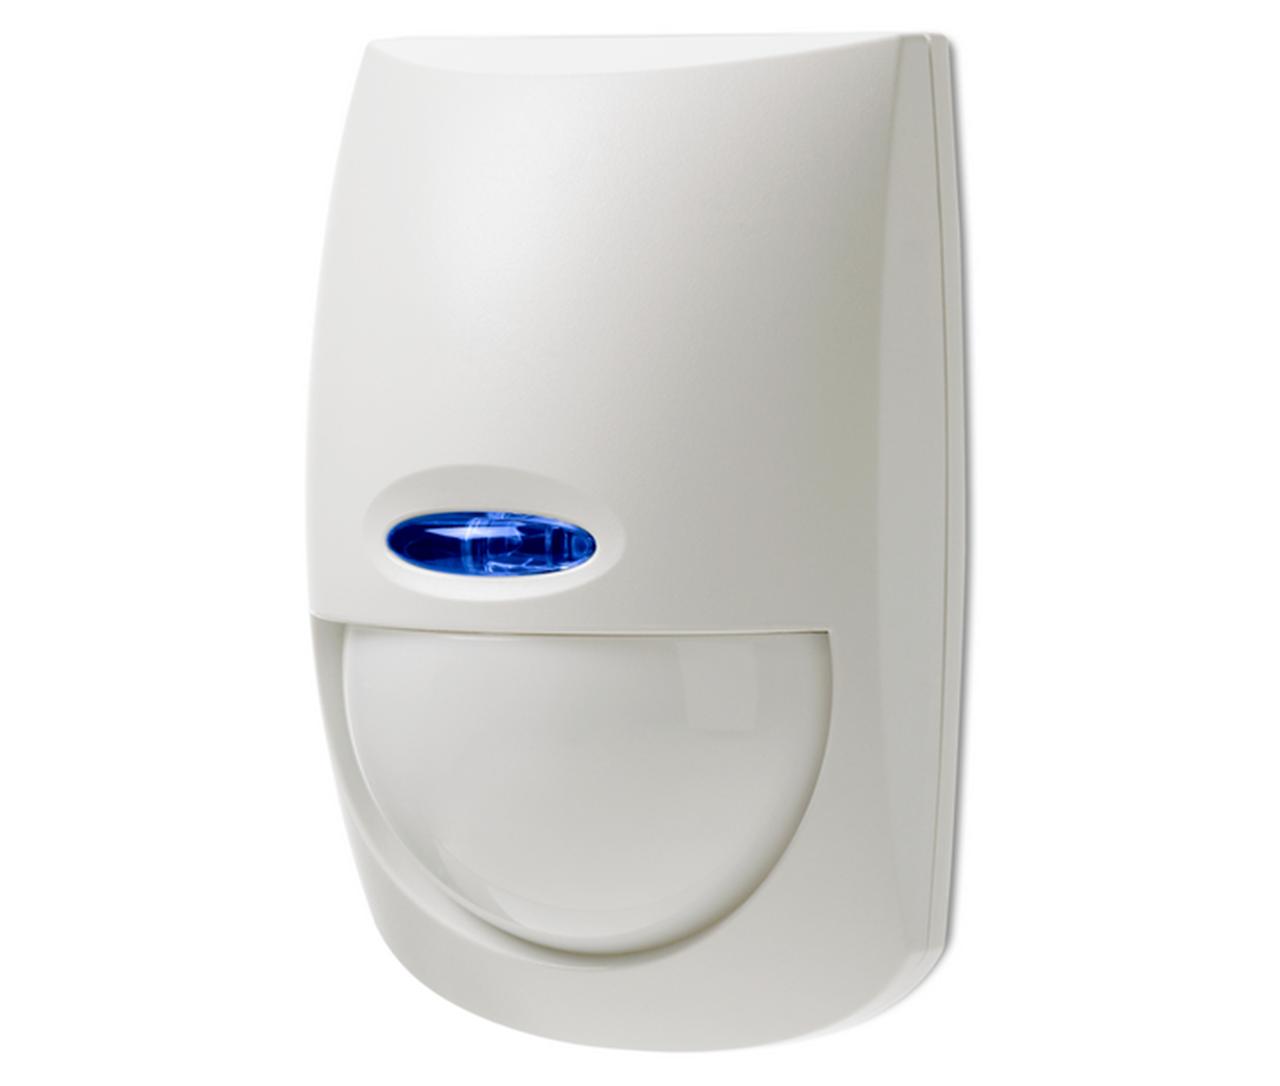 Bentel security BMD501 - Digital PIR Detector with Pet Immunity Armenia Vantag